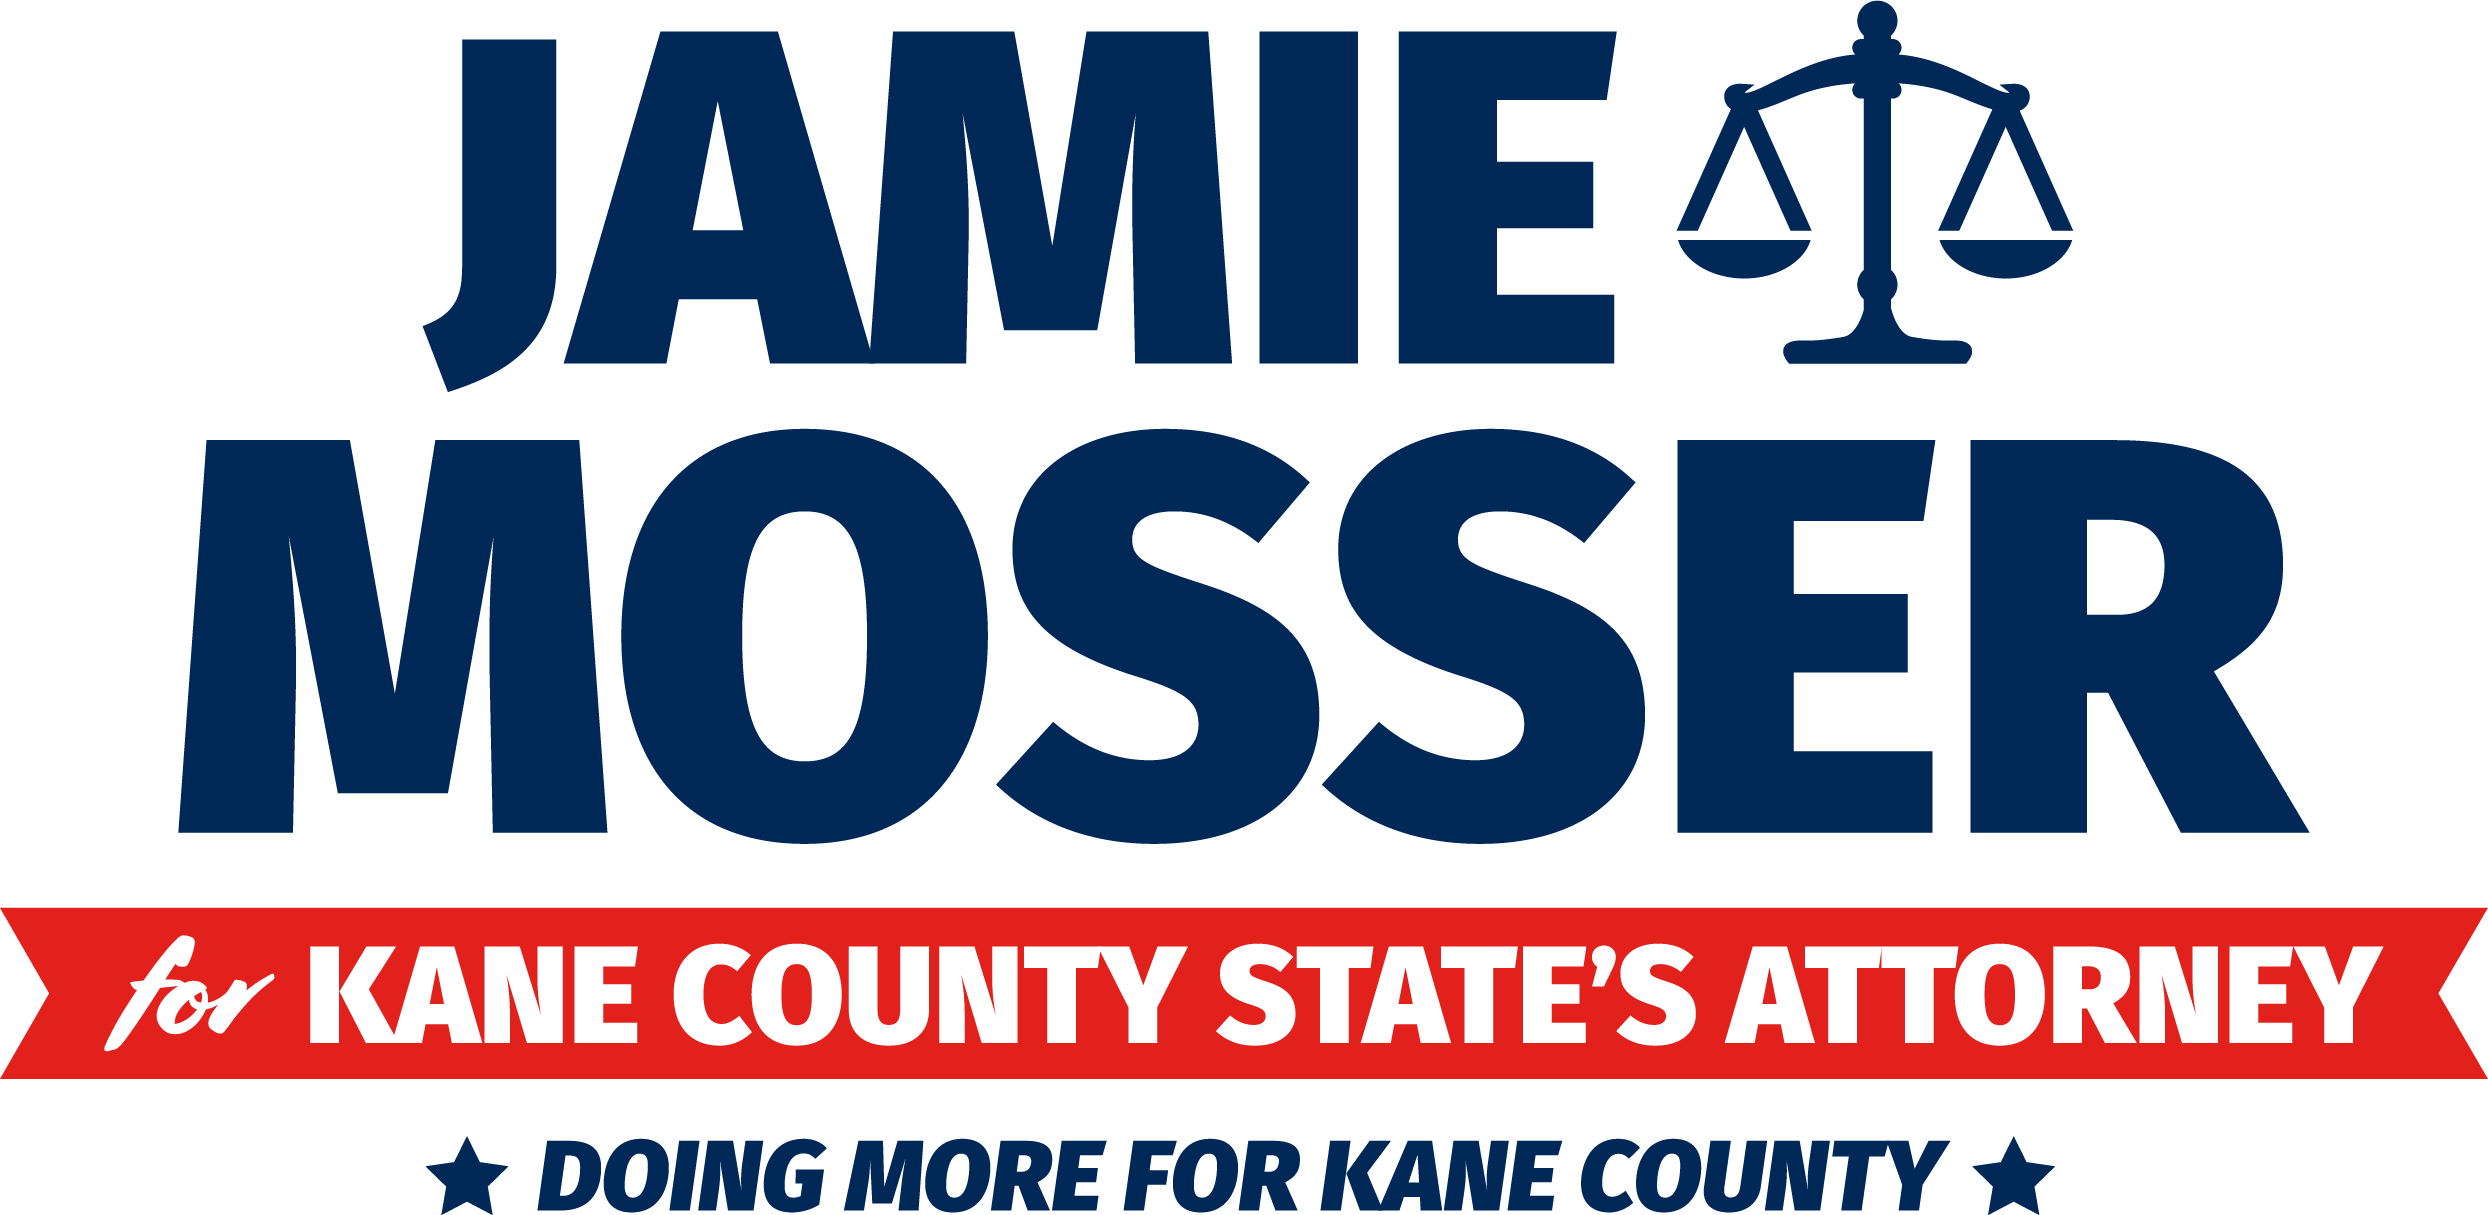 Jamie Mosser